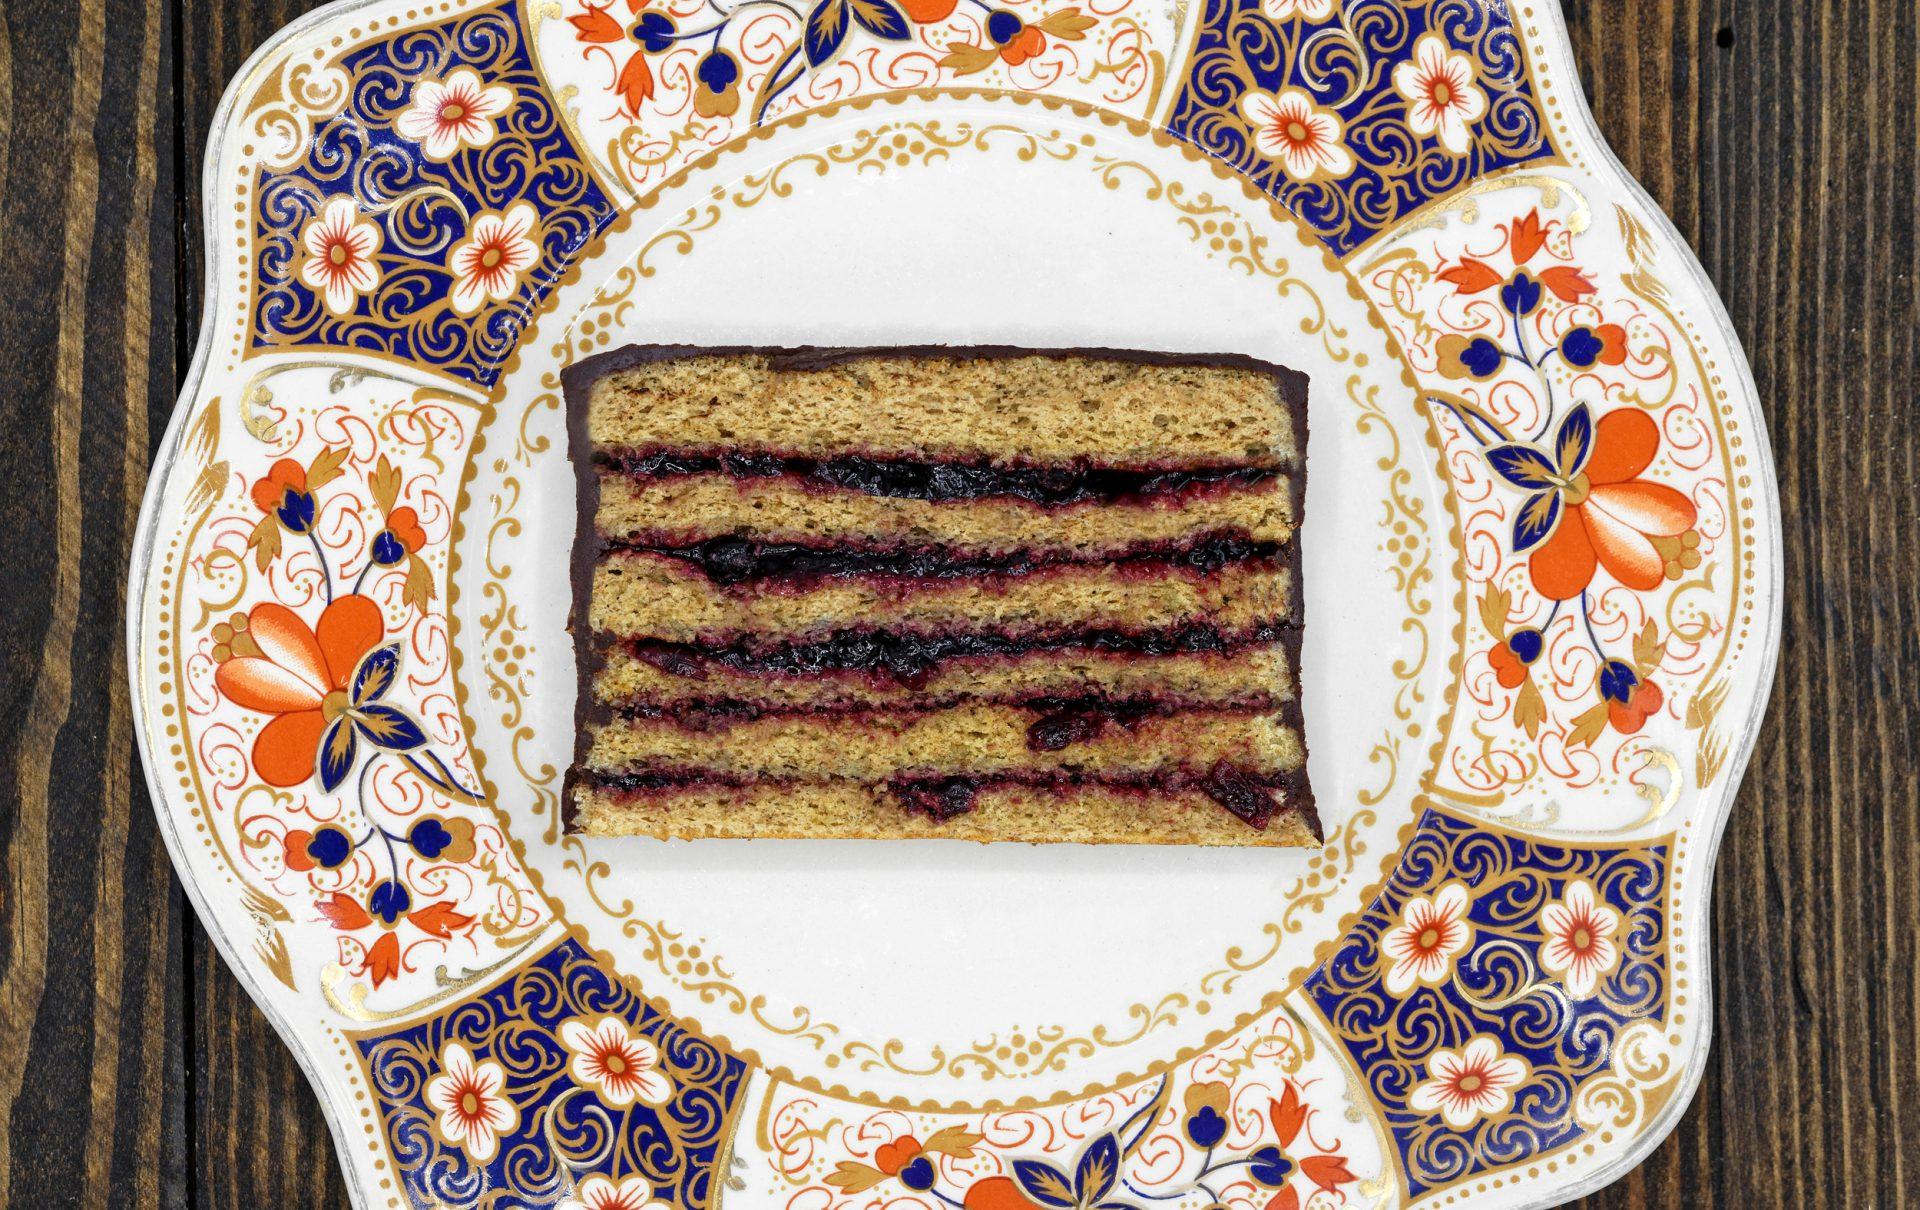 Russian Dessert - Rye Bread Cake with Blackcurrant Jam